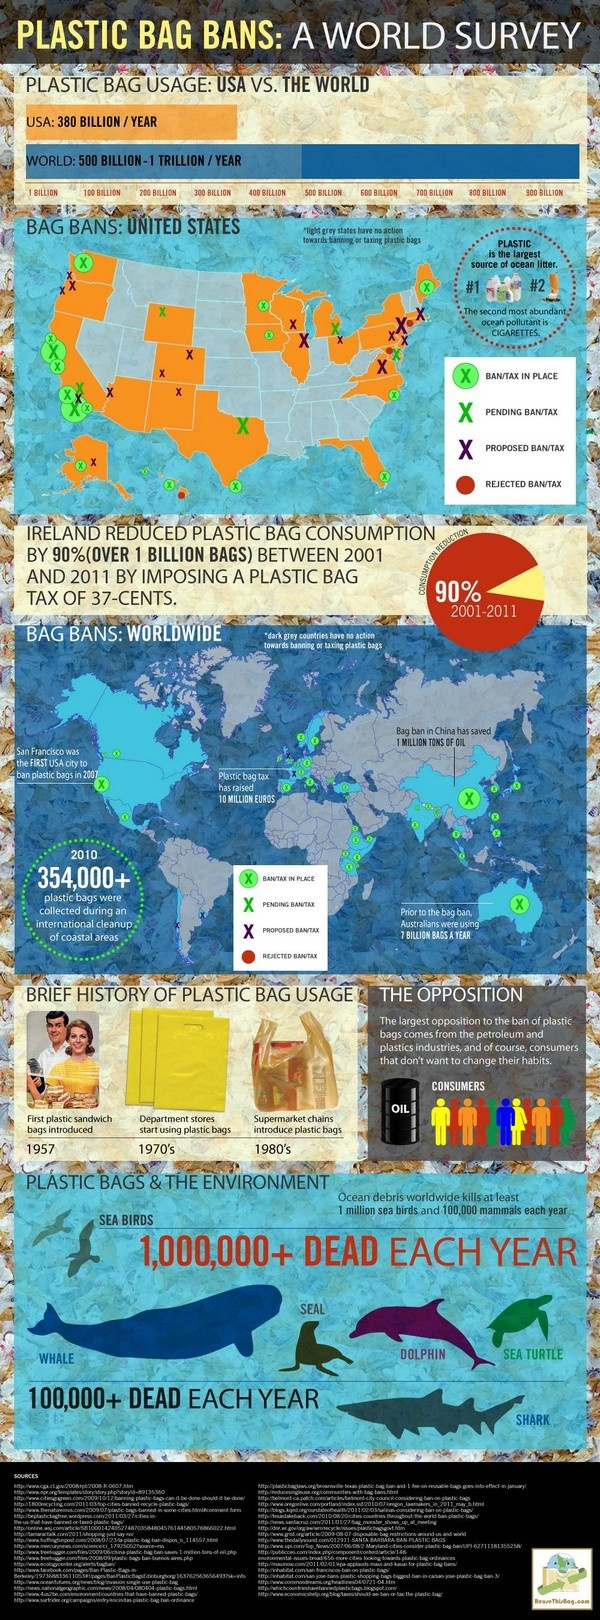 Plastic bag history - Plastic Bags